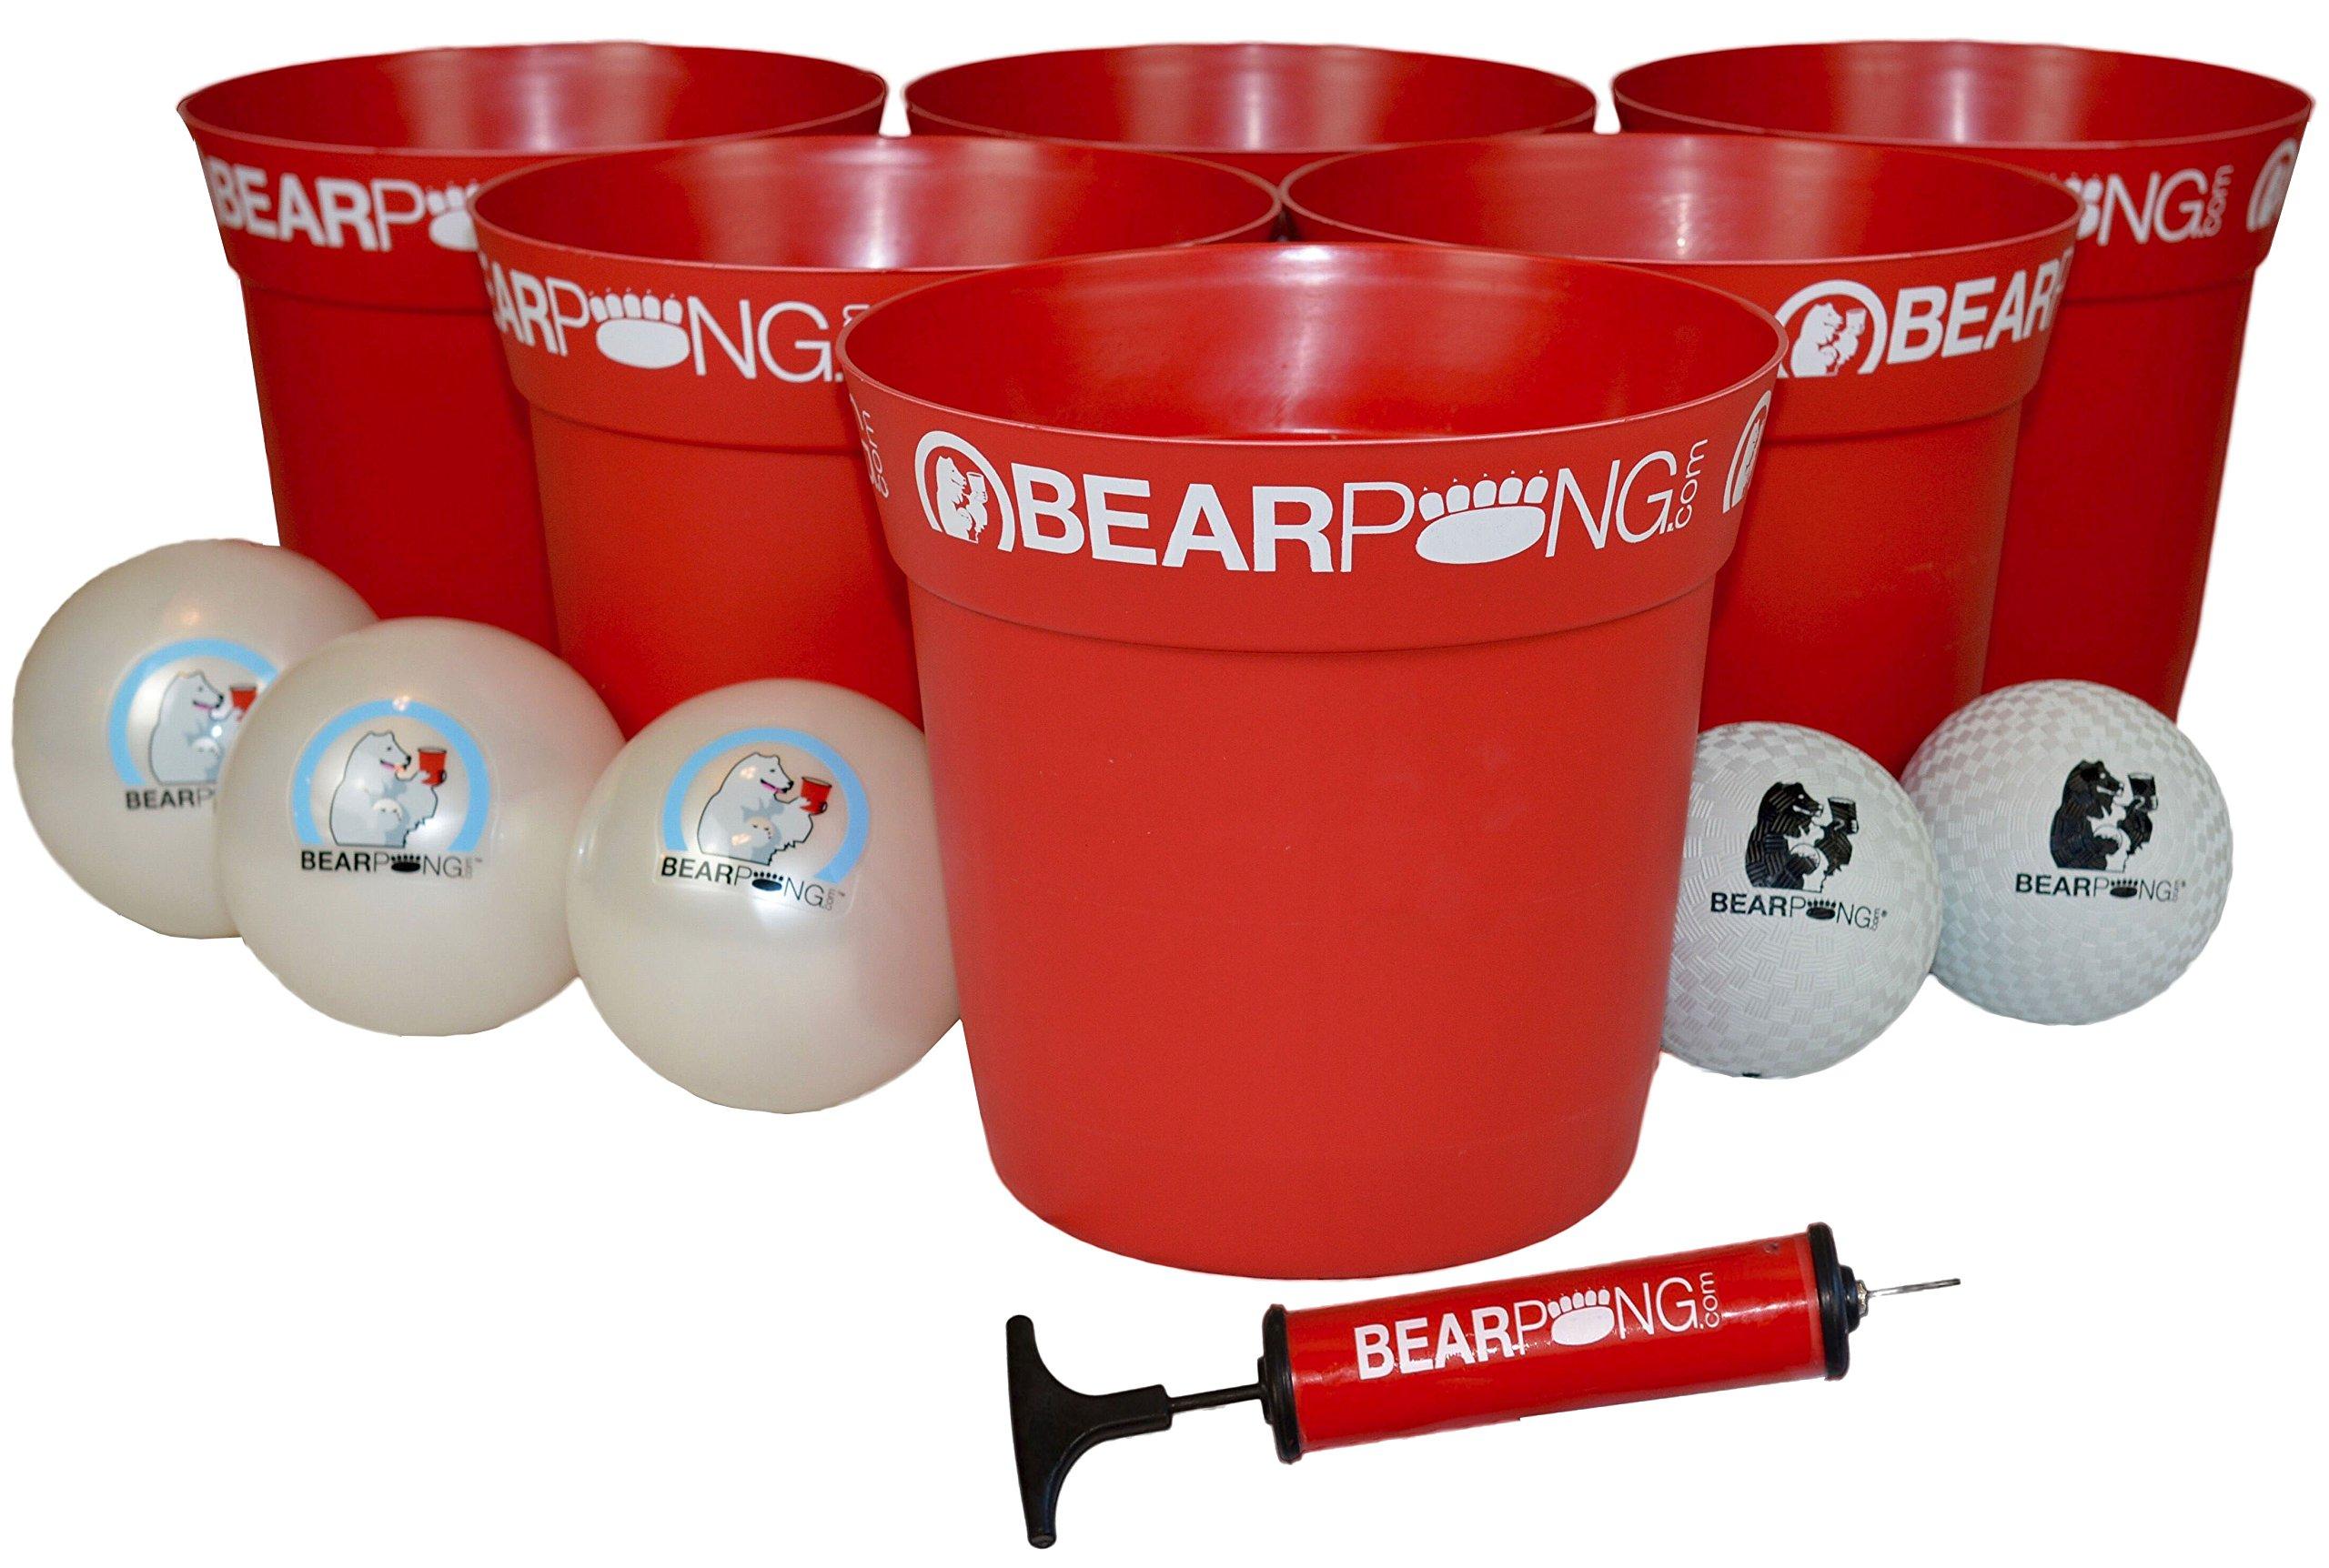 Bearpong Deluxe Game Set: 12 BEARPONG Buckets, 3 BEARPONG Balls, 2 Beach Balls, 1 Ball Pump with Carrying Case, and Instructions (Red) by Bear Pong